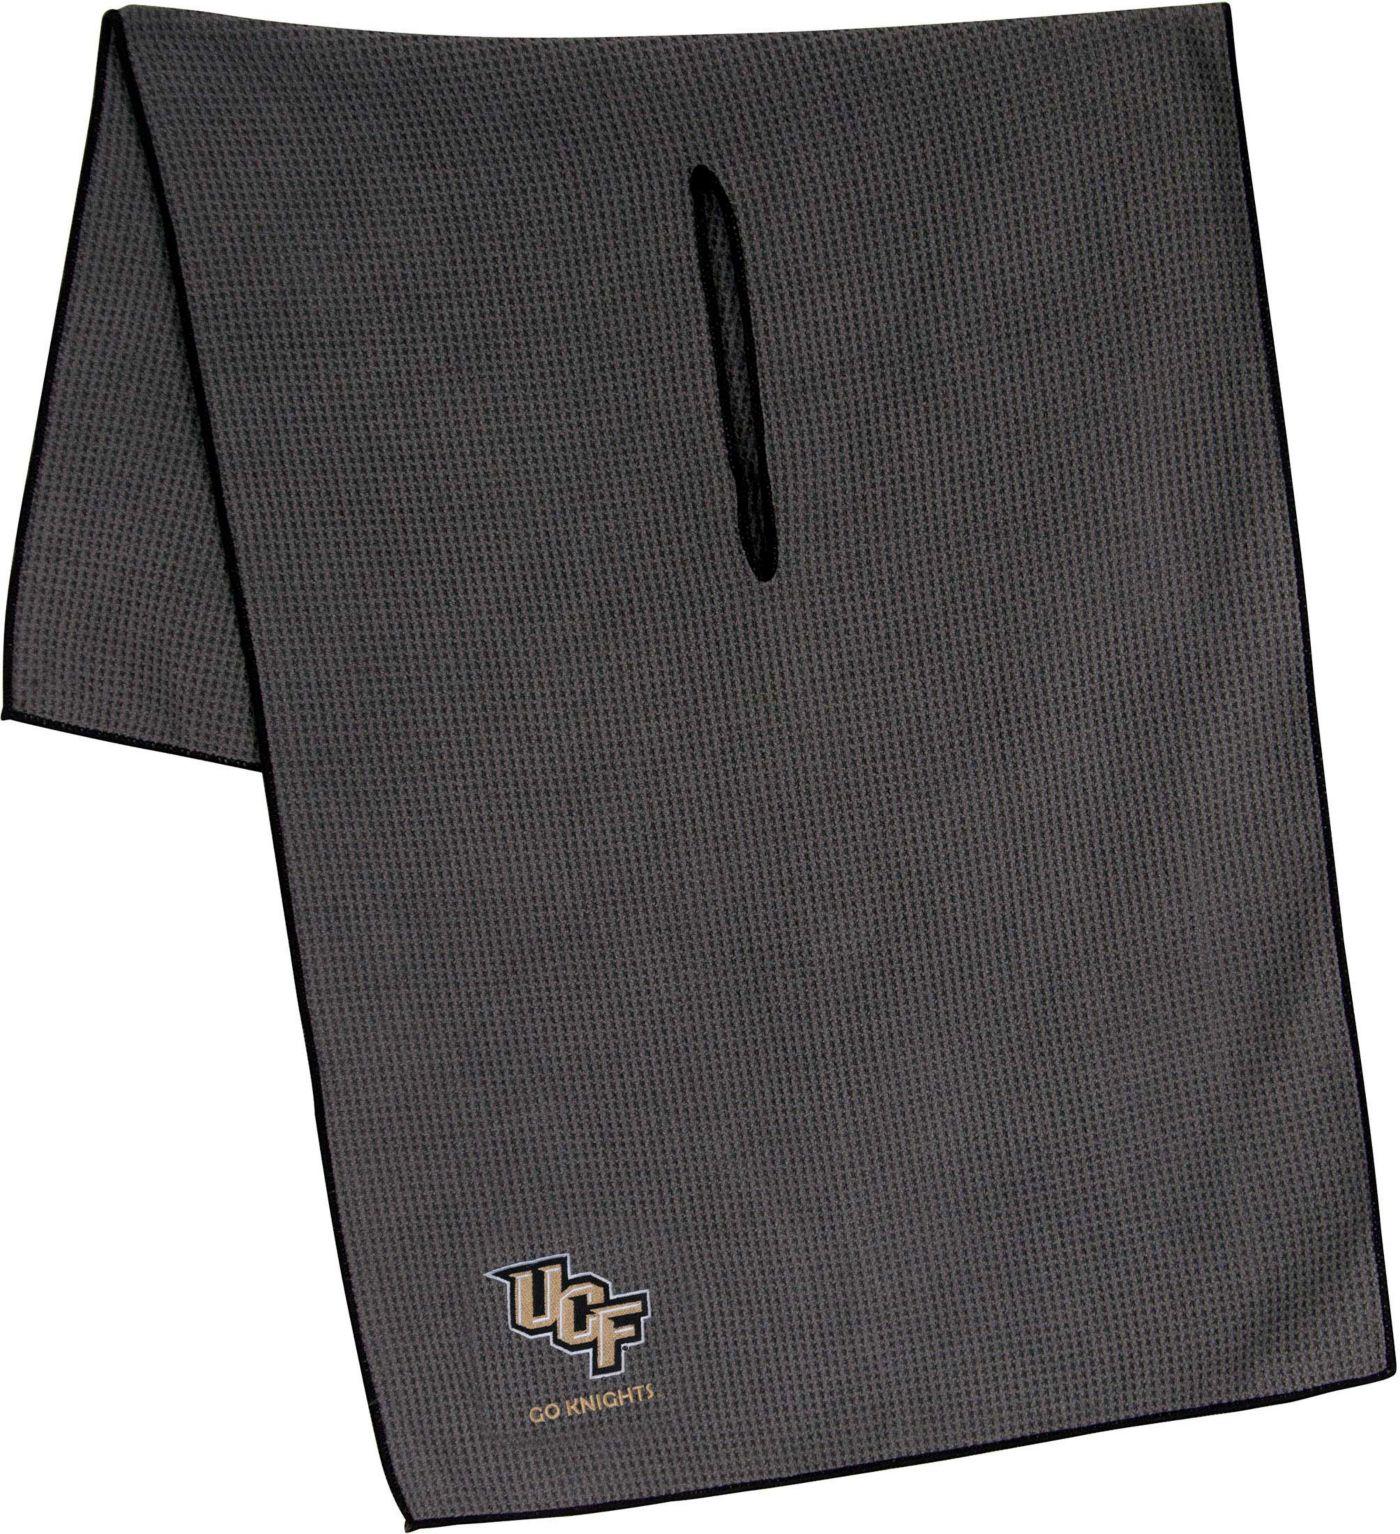 "Team Effort UCF Knights 19"" x 41"" Microfiber Golf Towel"